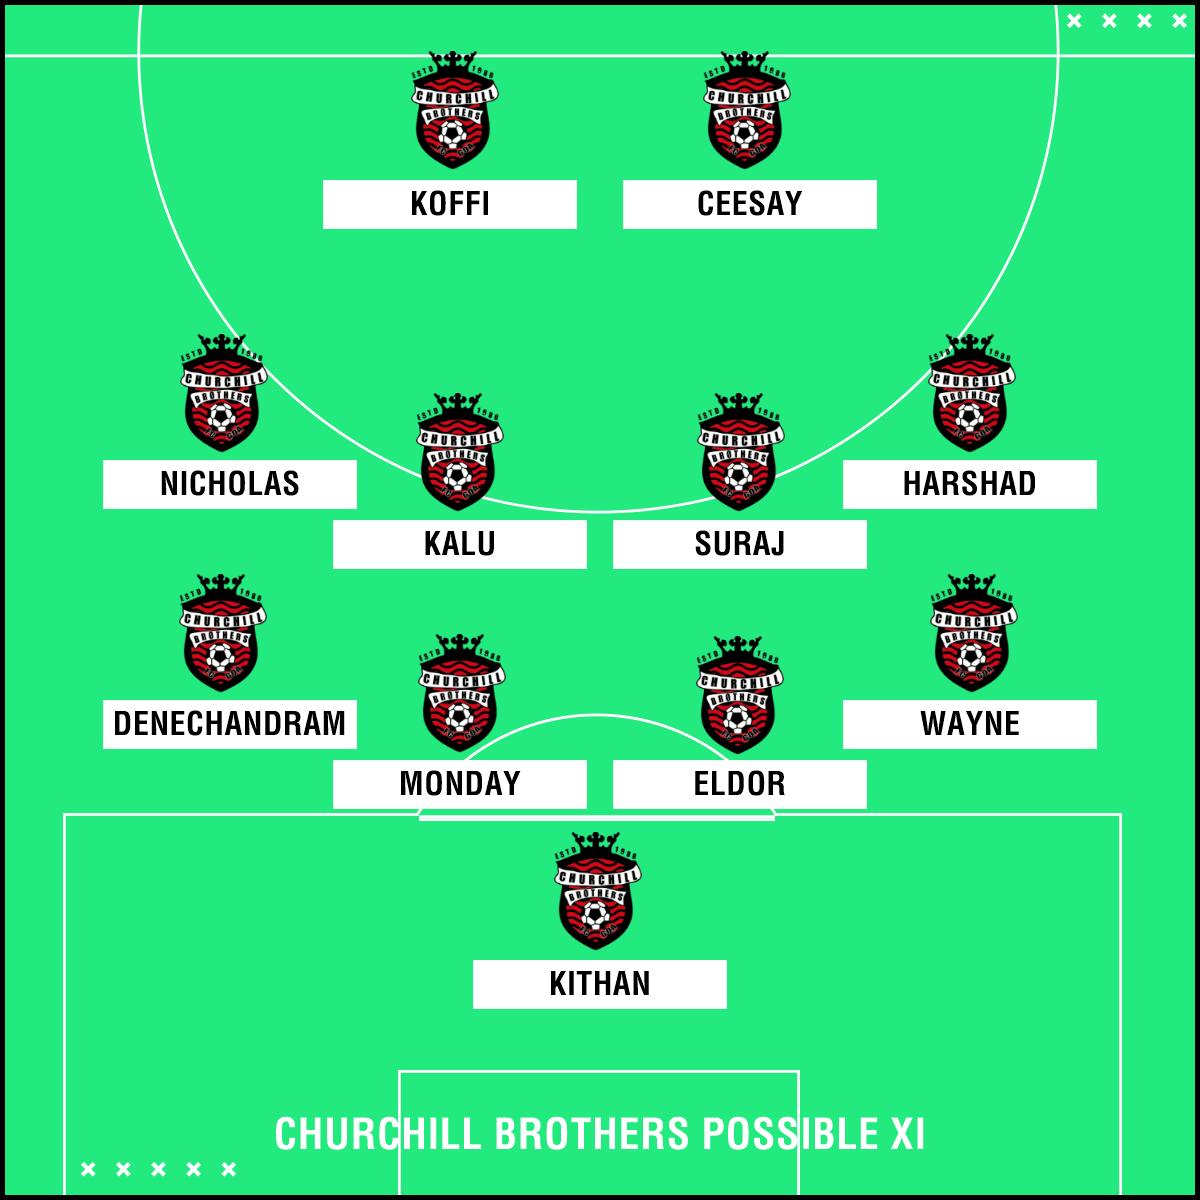 Churchill Brothers possible XI v NEROCA FC